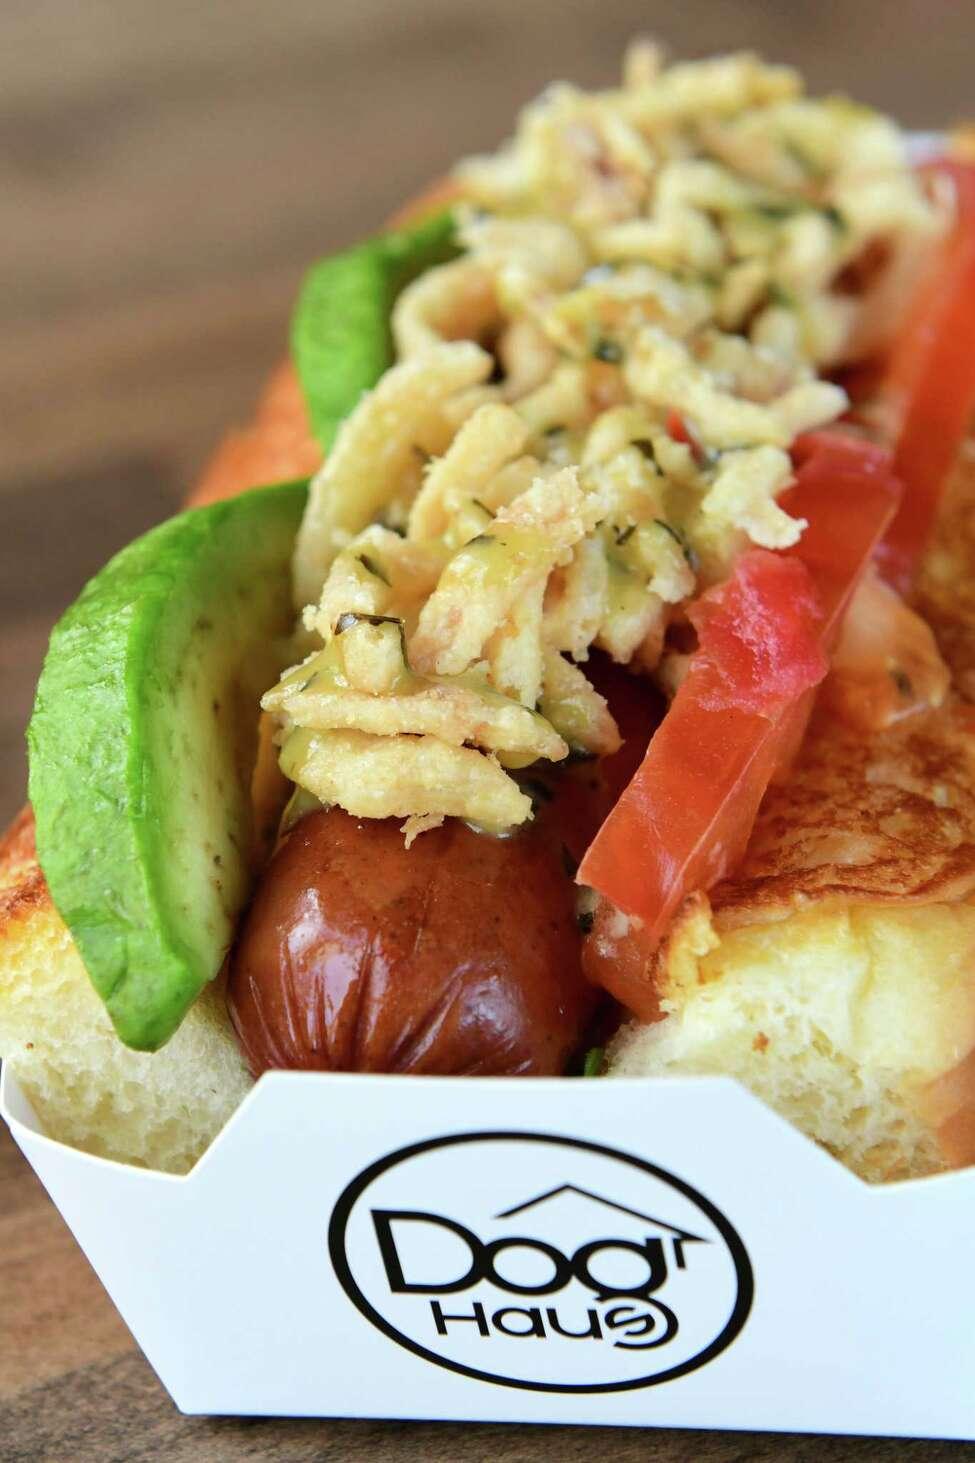 Sooo cali haus dog - wild arugula, avocado, tomato, crispy onions, spicy basil aioli at Dog Haus Biergarten on Wednesday, June 12, 2019 in Clifton Park, N.Y. (Lori Van Buren/Times Union)